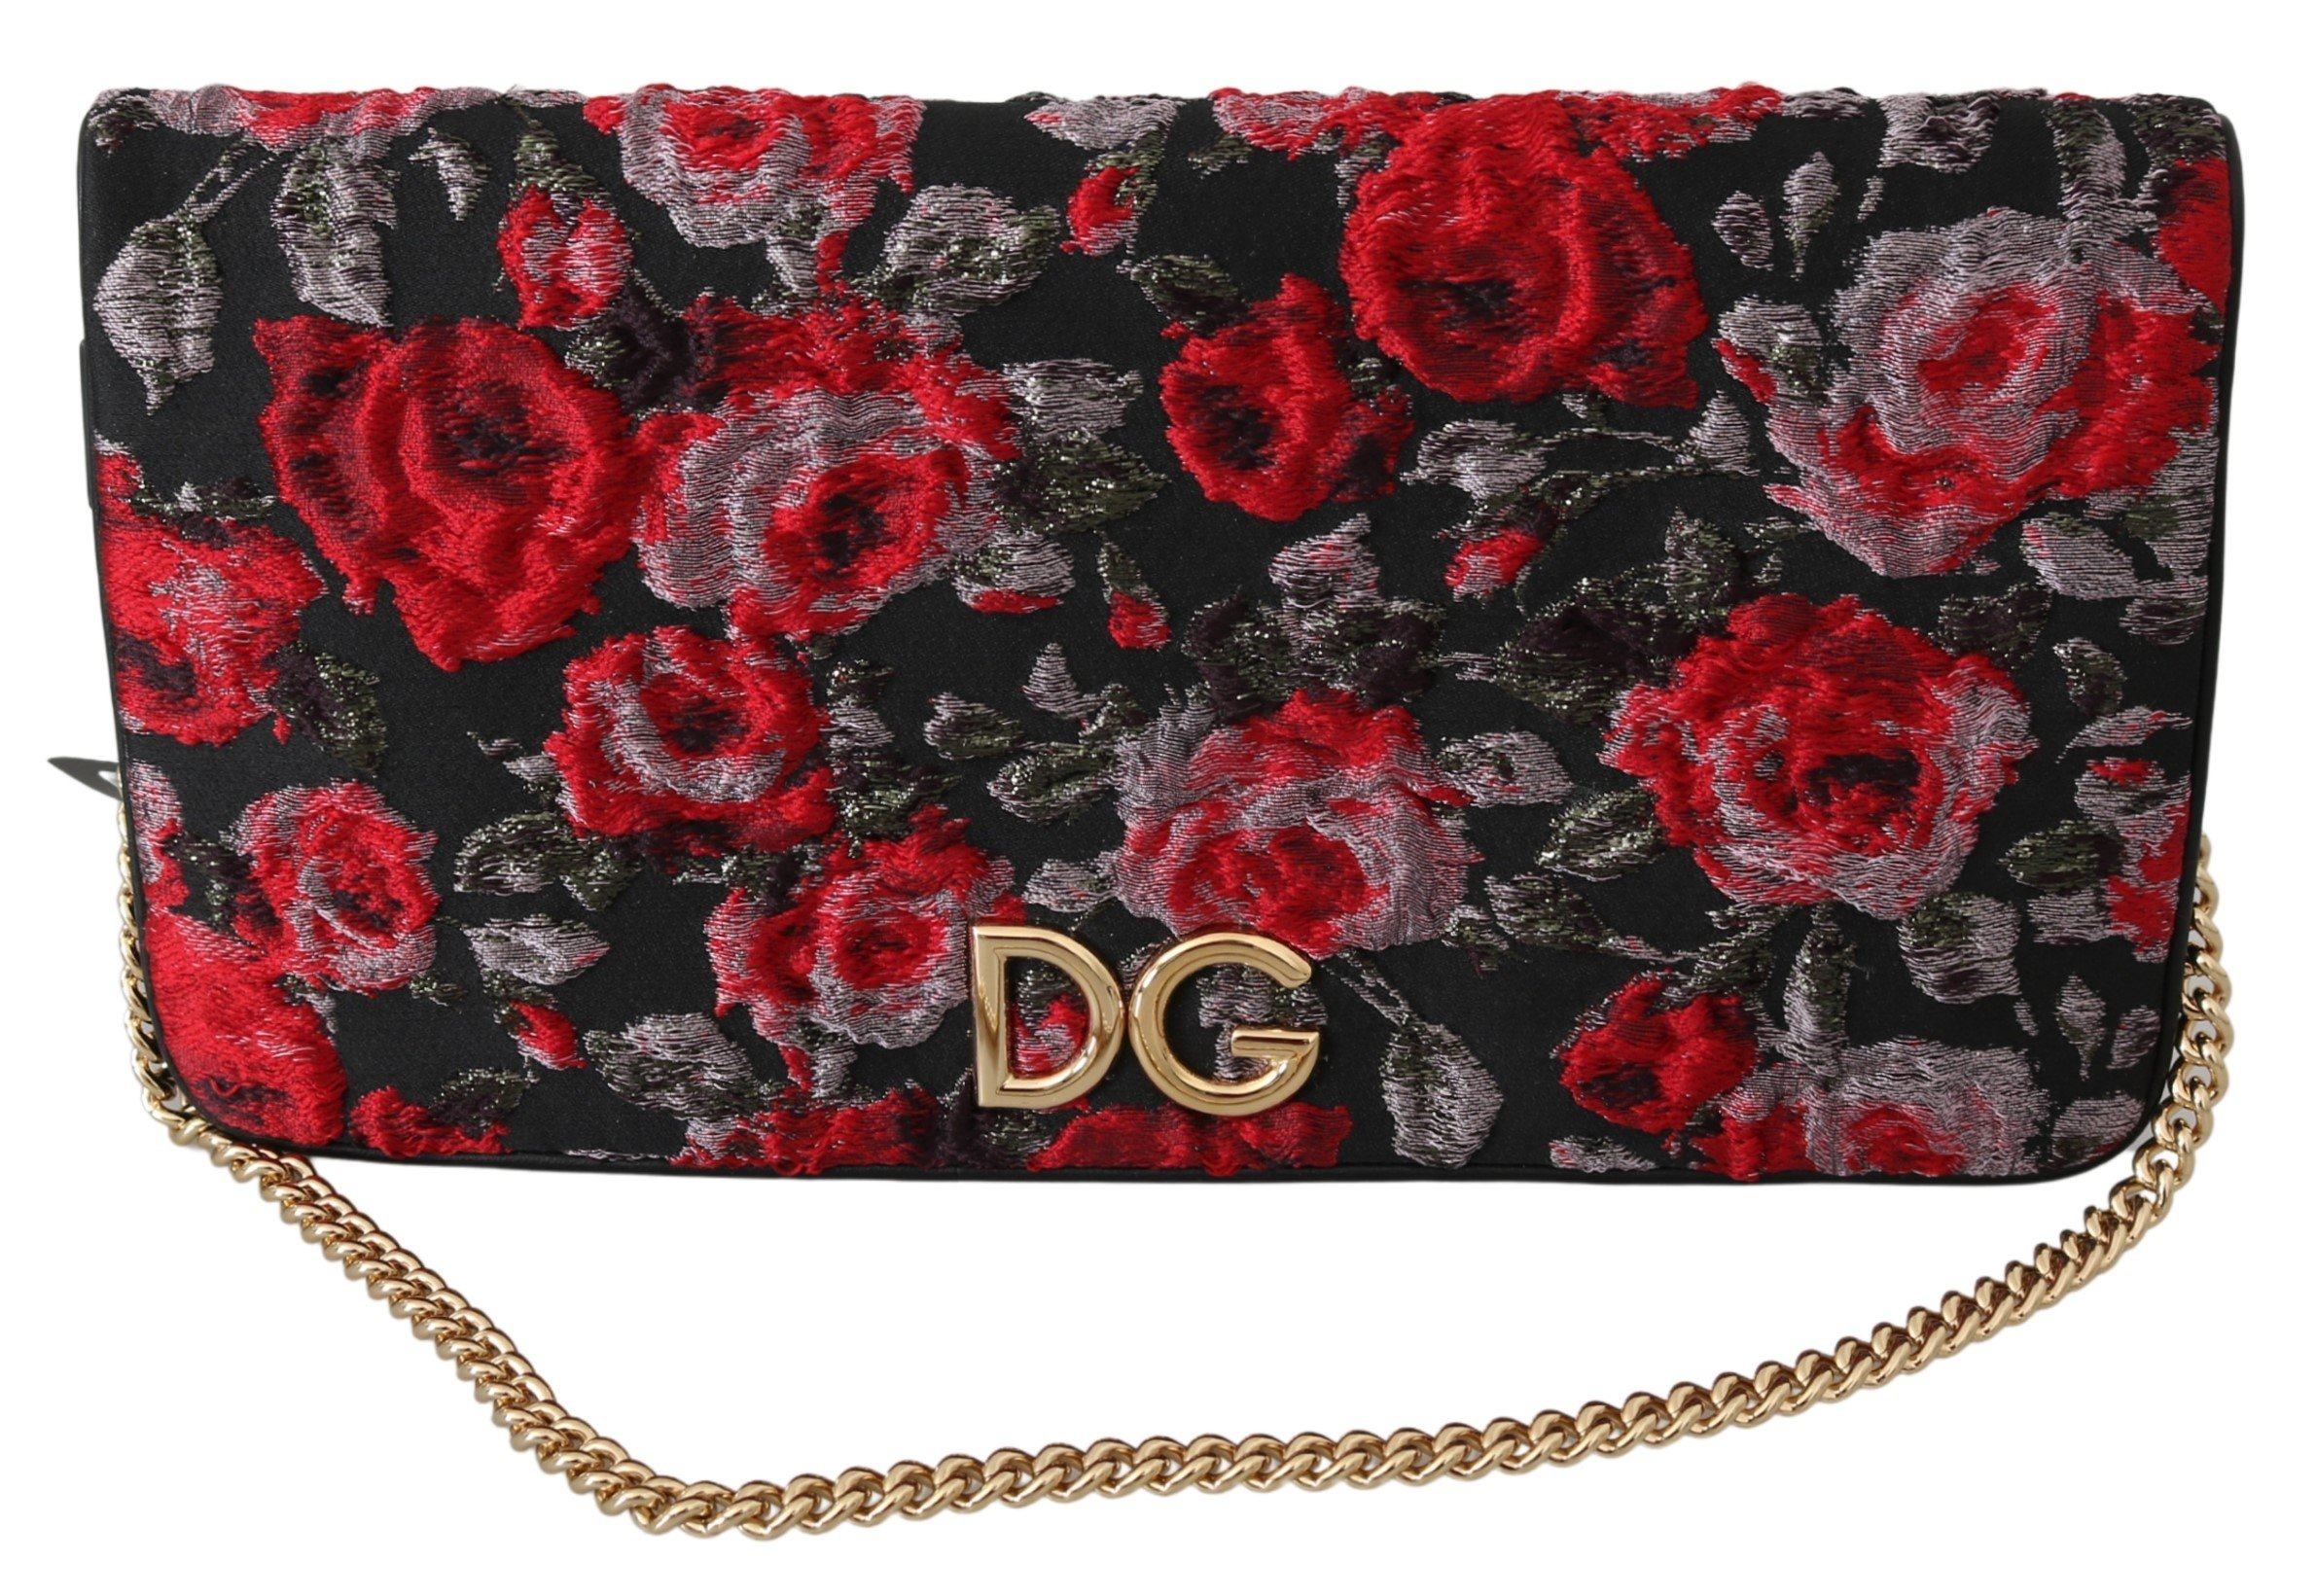 Dolce & Gabbana Women's Roses Jacquard Clutch Bag Black VAS9921